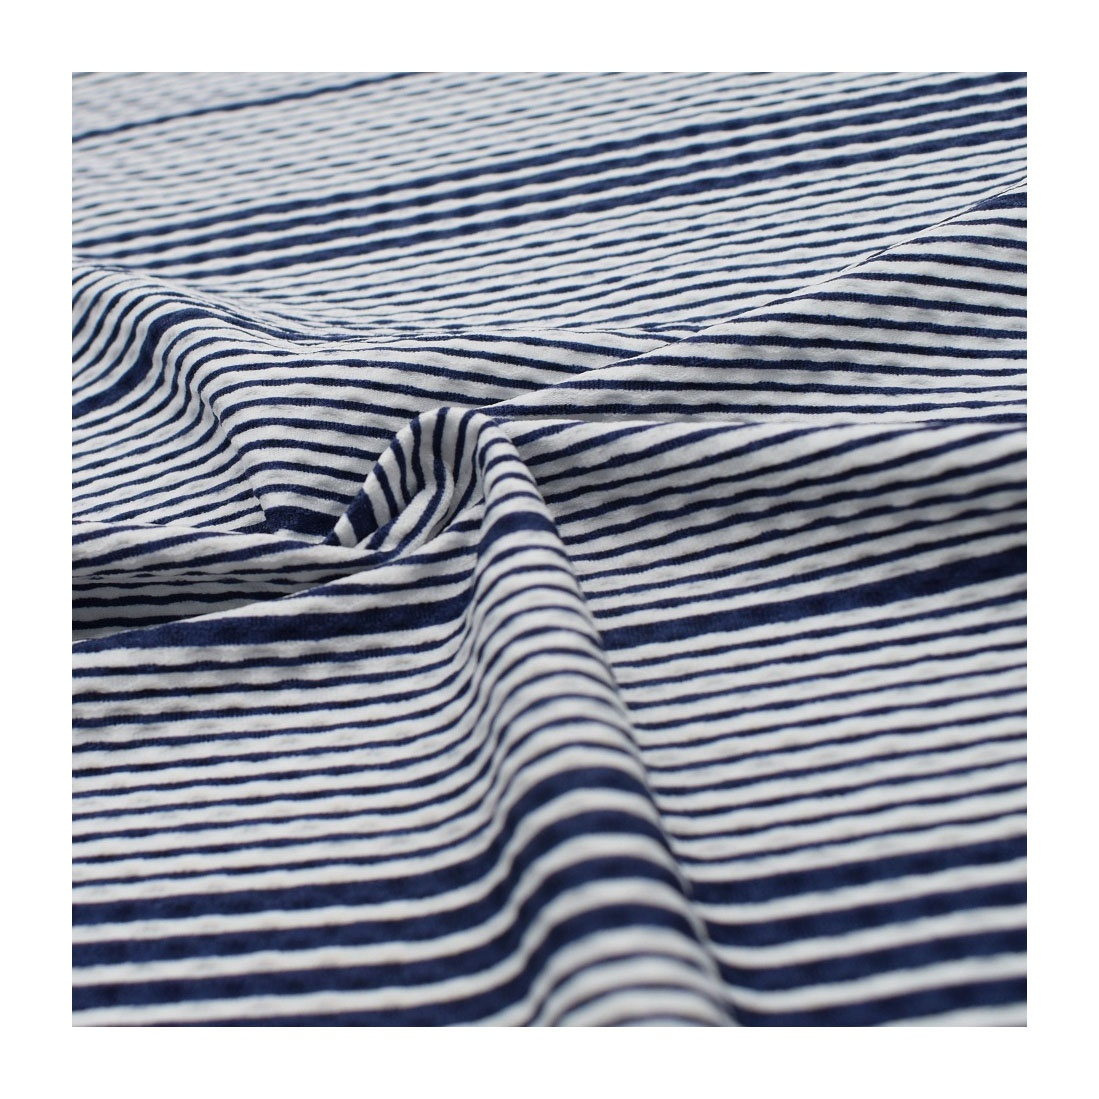 Knitted printing Nylon Spandex jacquard fabric for Swimwear bikini custom printing